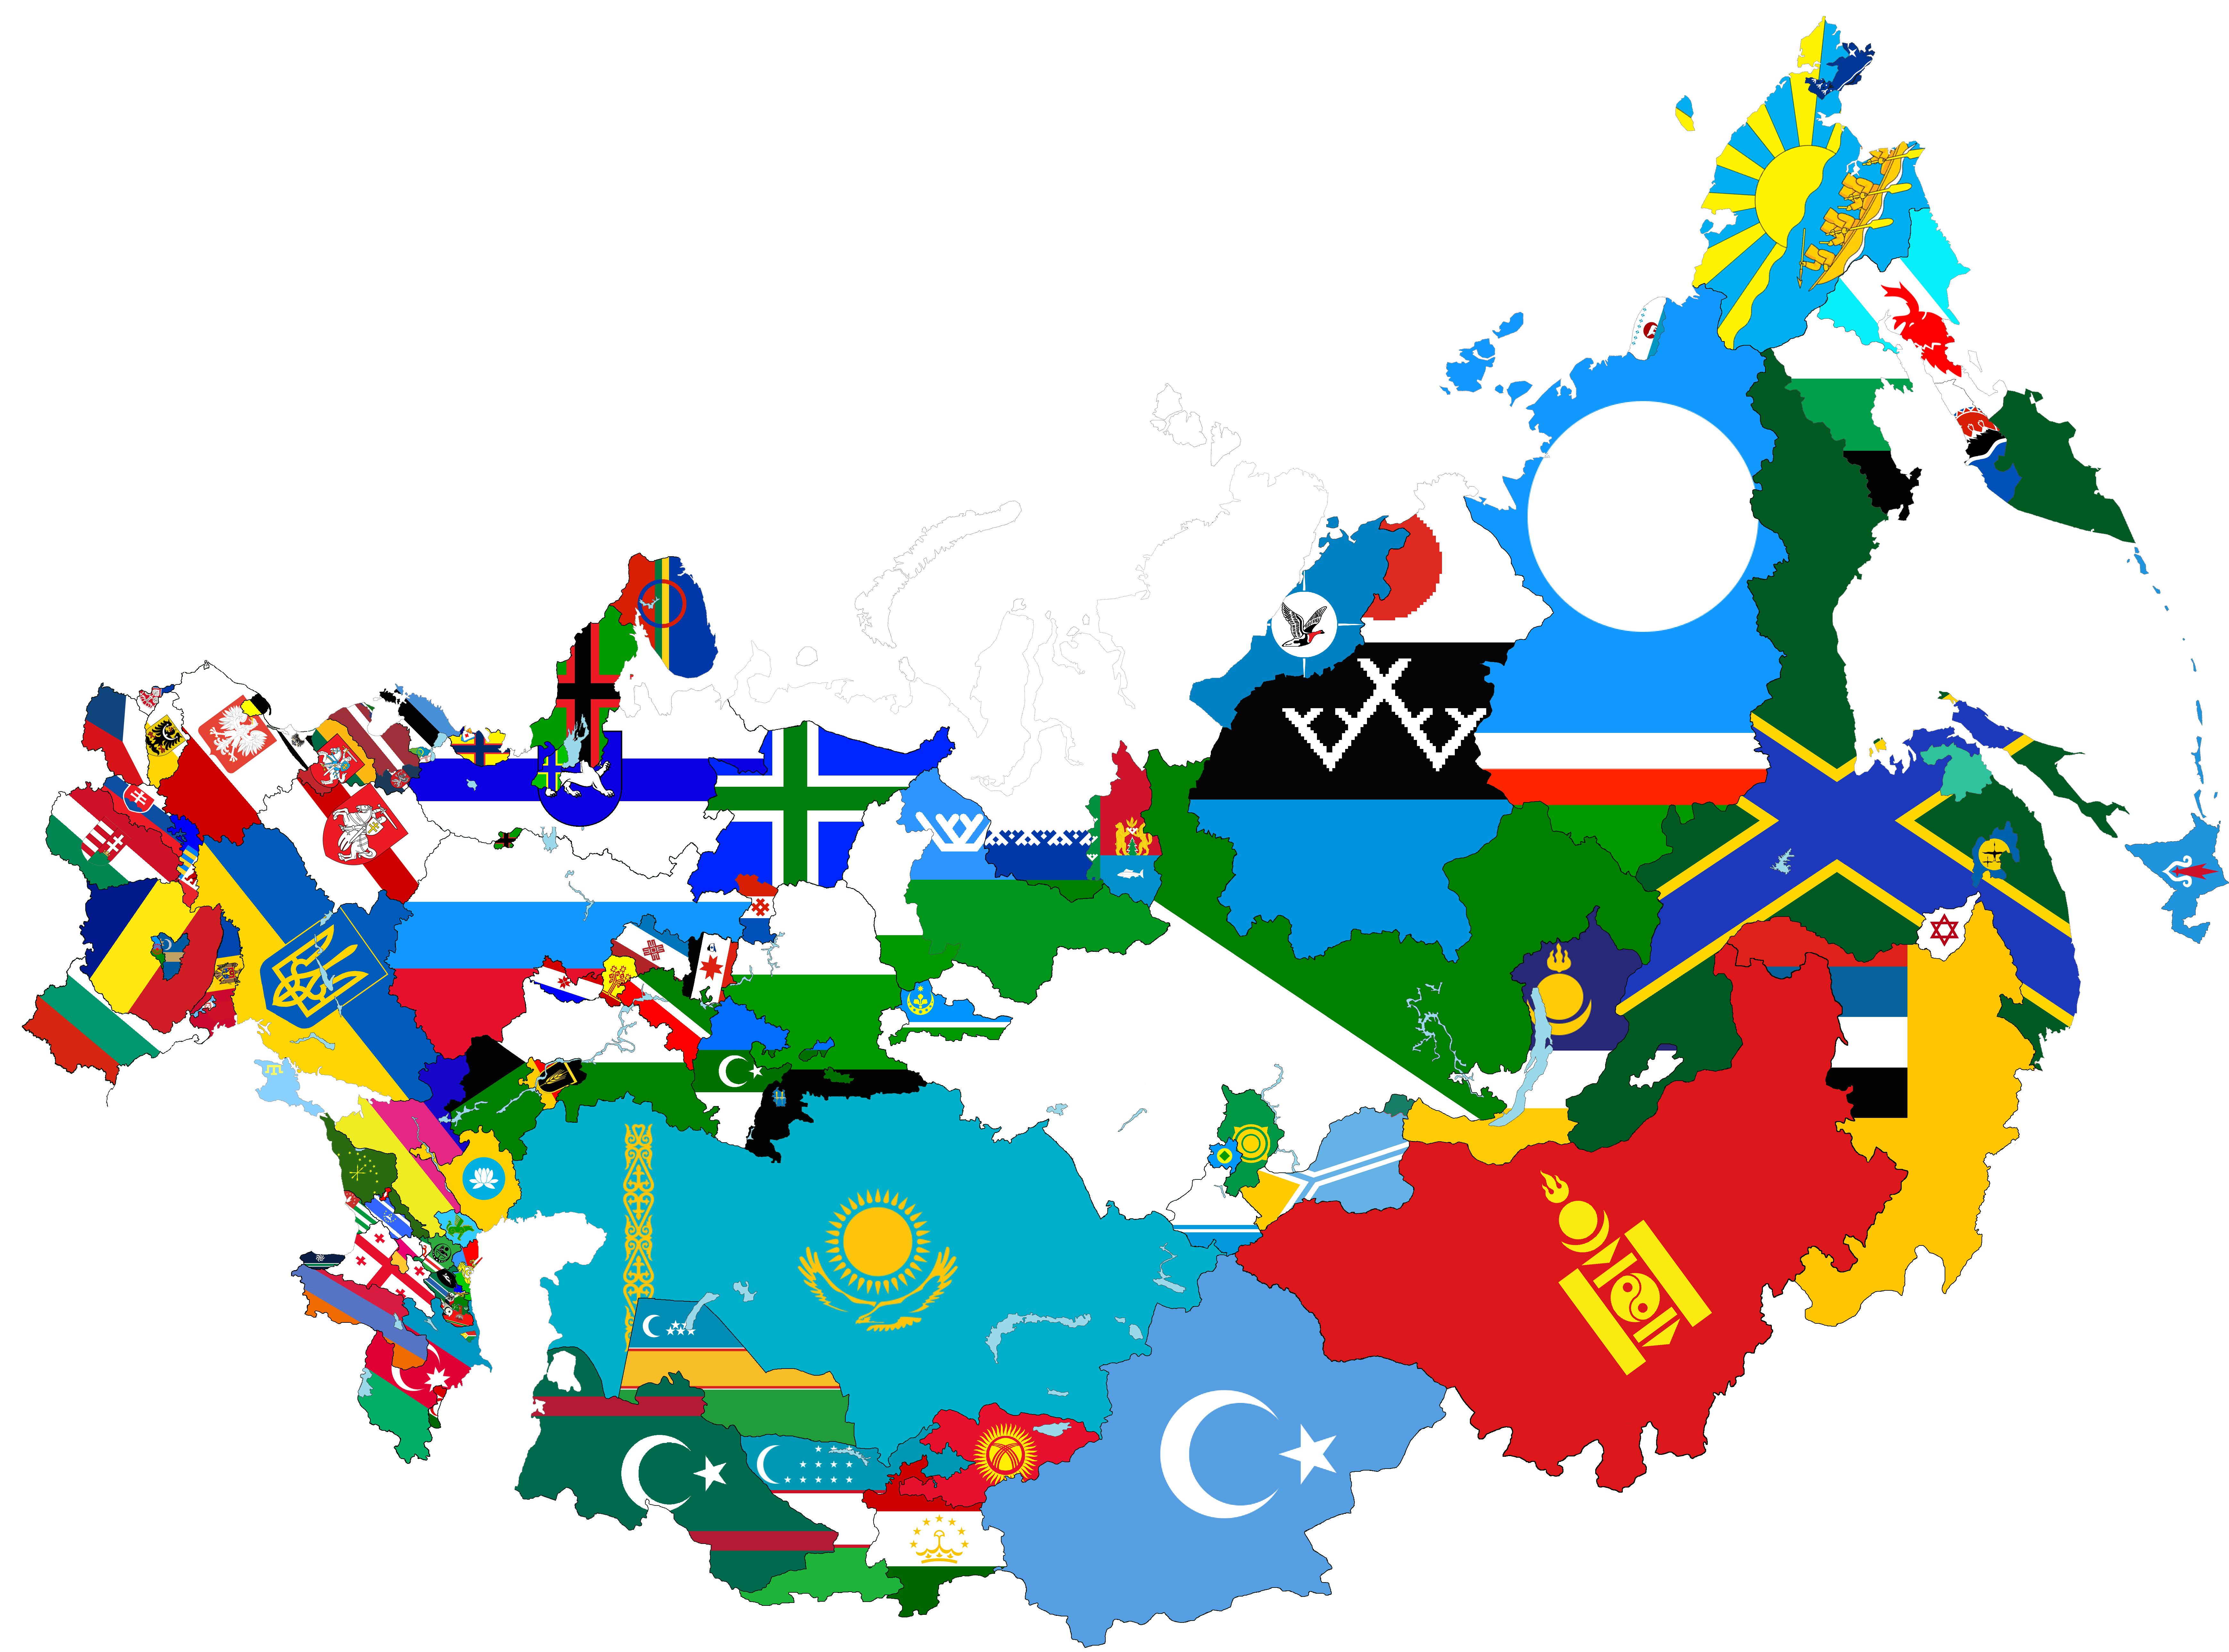 Ethnic Map Of Russia Ethnic map of Russia and post Soviet countries by IlyaNevelny on